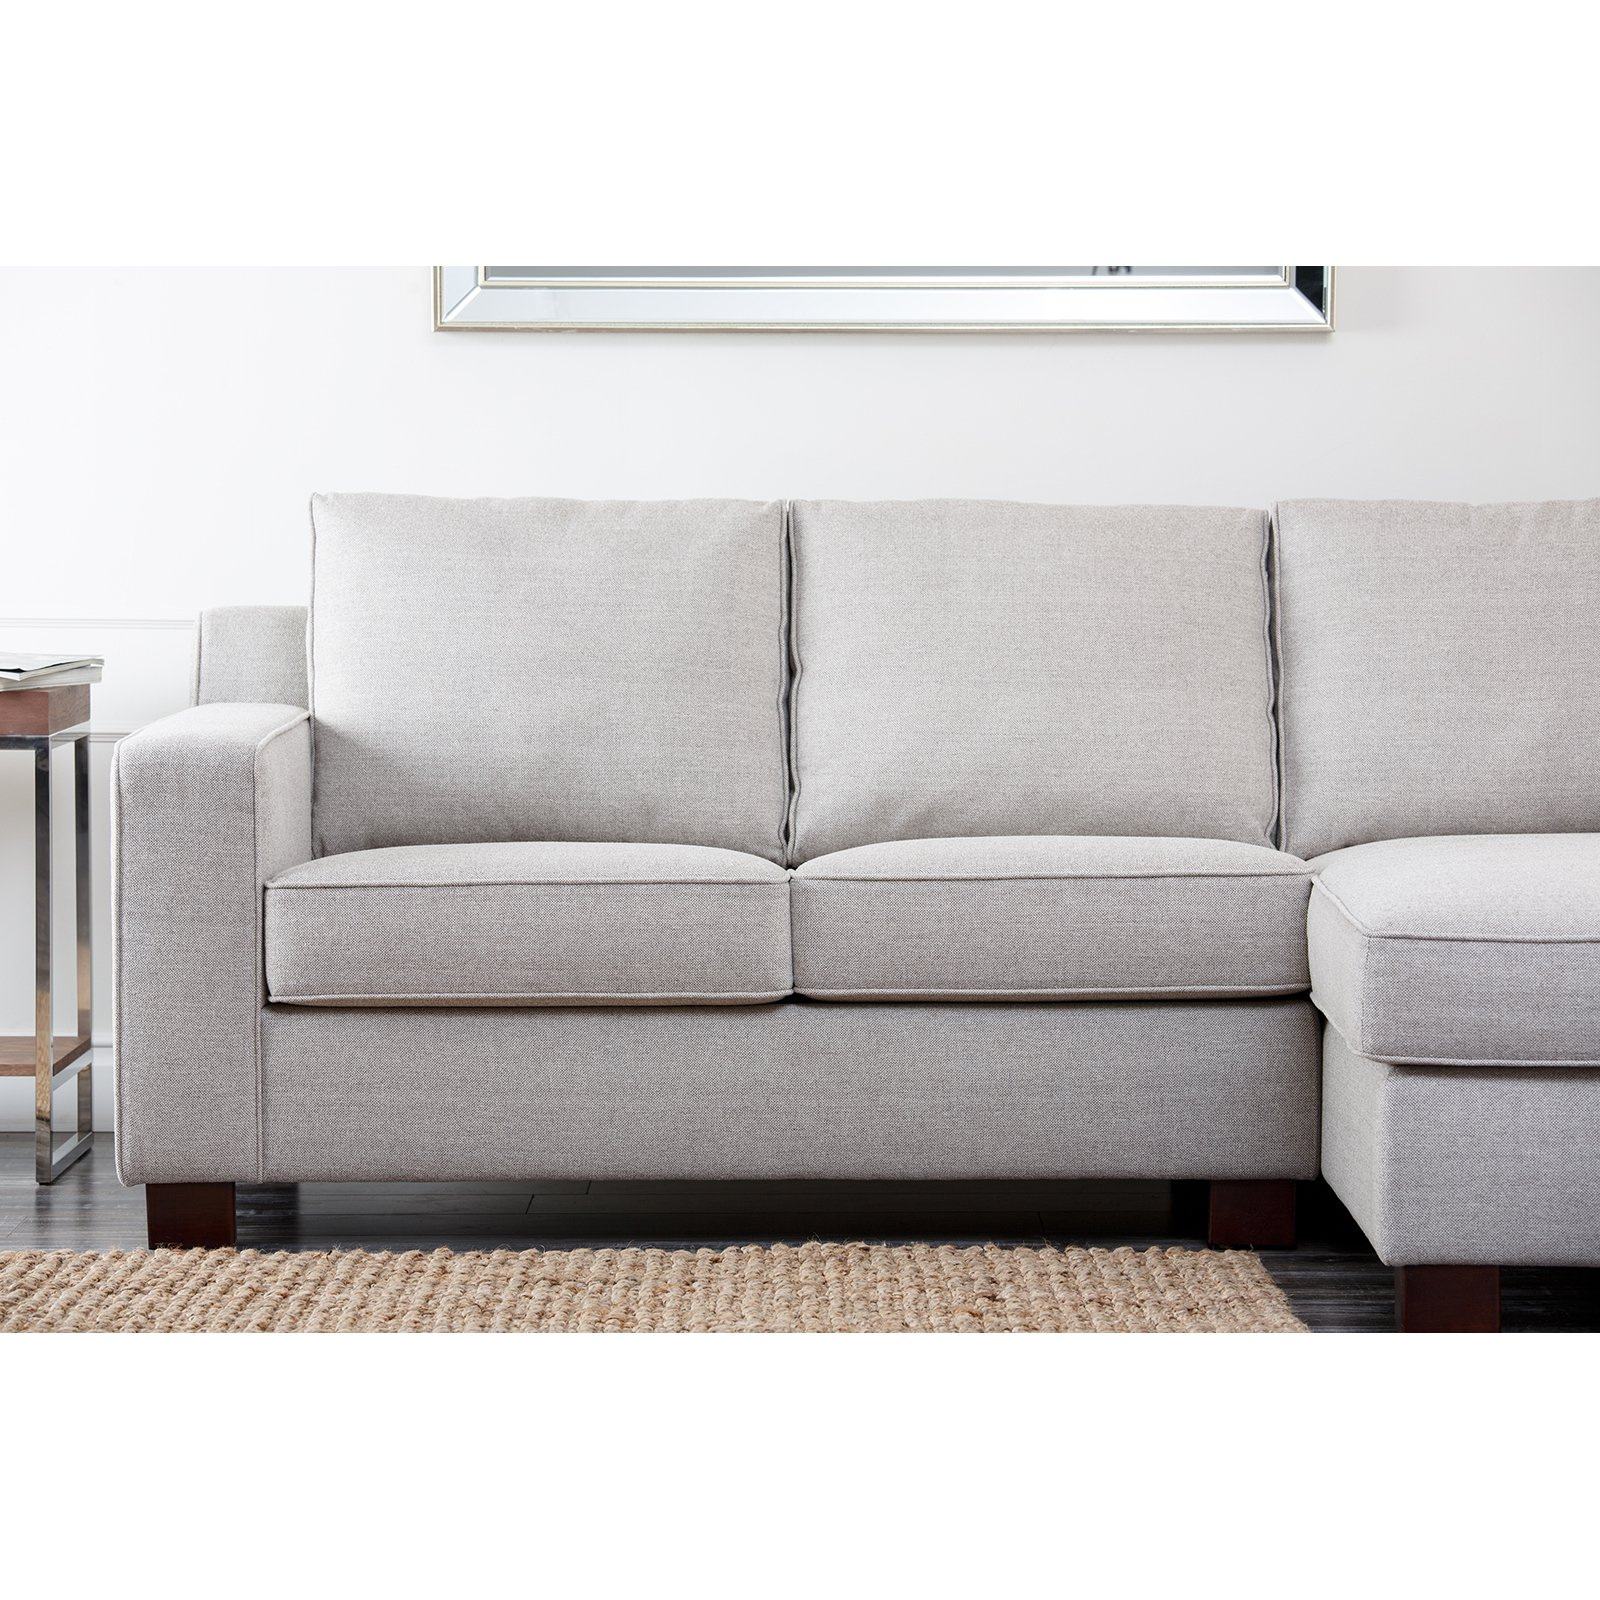 Abbyson Regina Sectional Sofa   Gray   Walmart.com